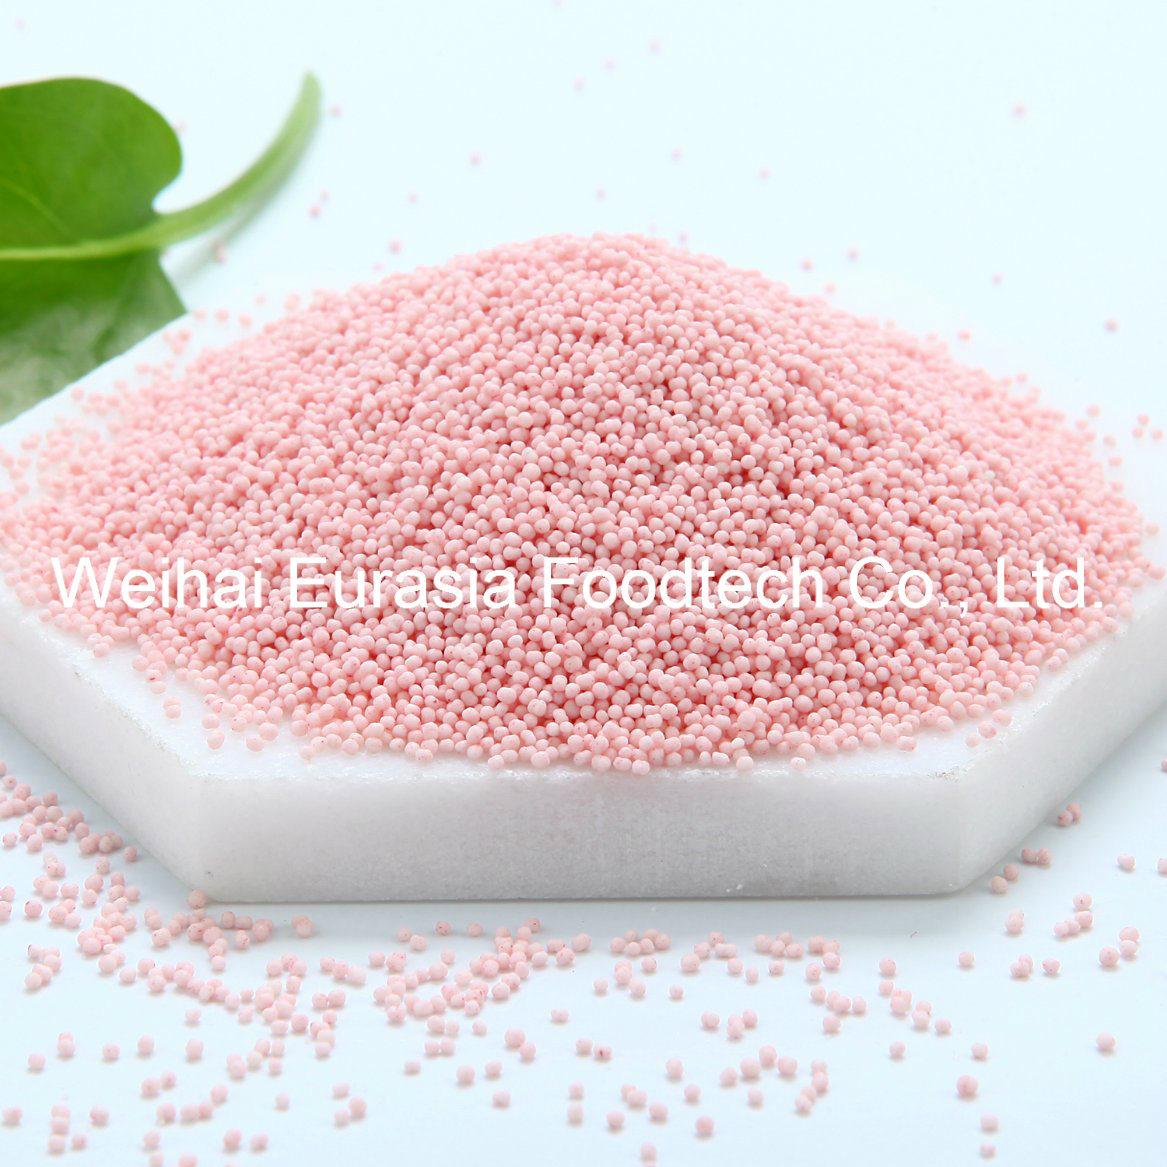 Chromium Picolinate Sustained-Release Pellets/Food Additive